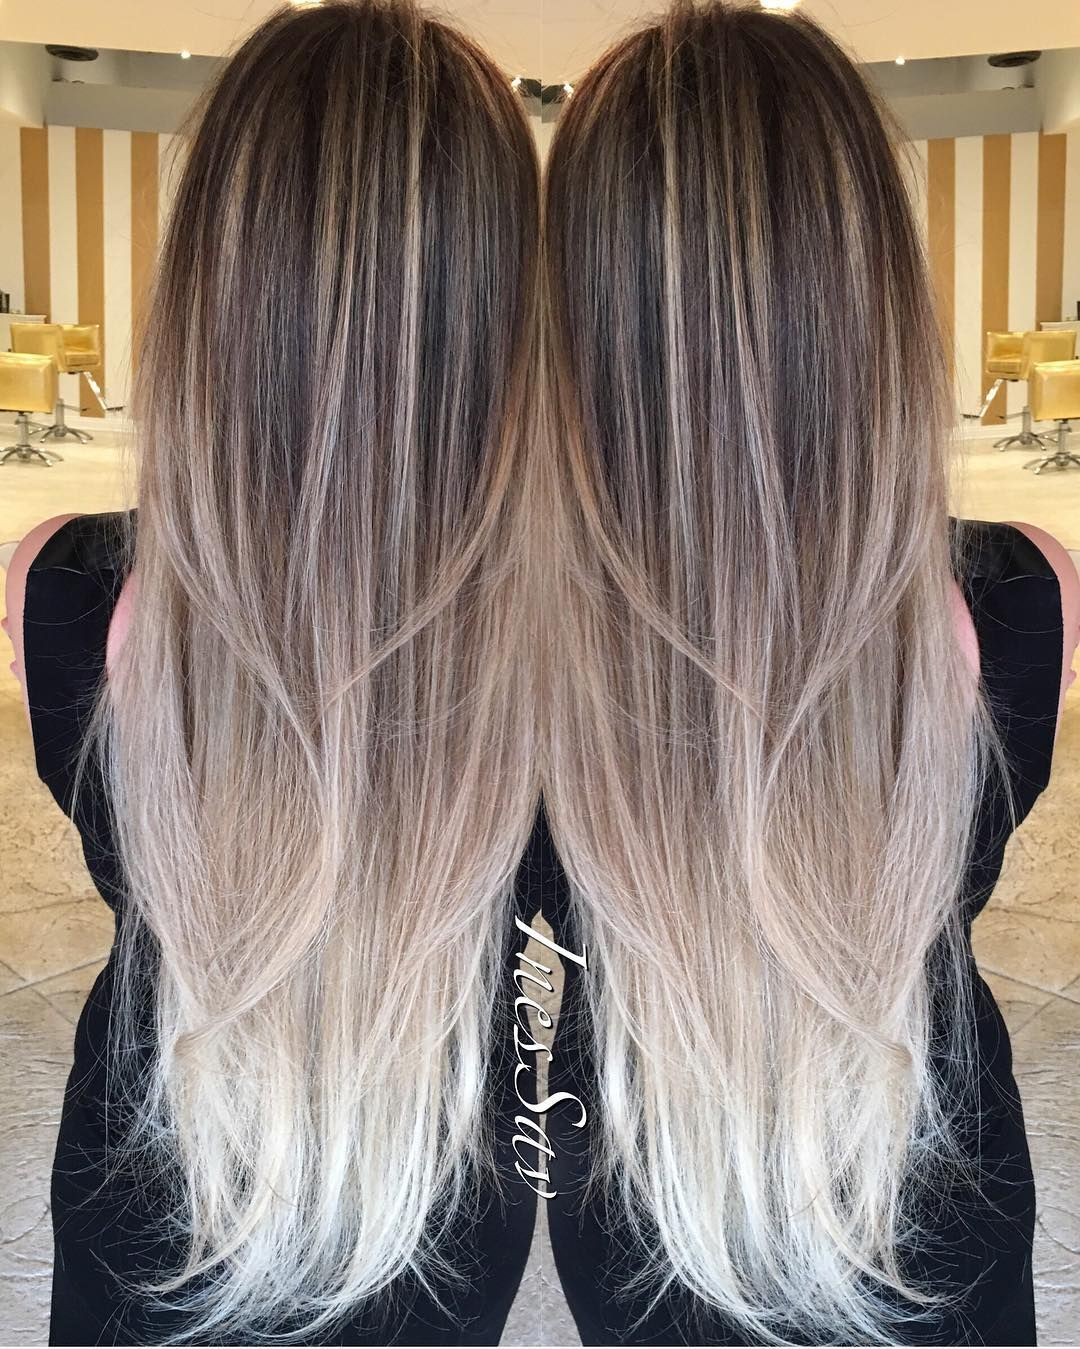 Boy hair color images hair  haare  color de cabello  pinterest  hair style hair